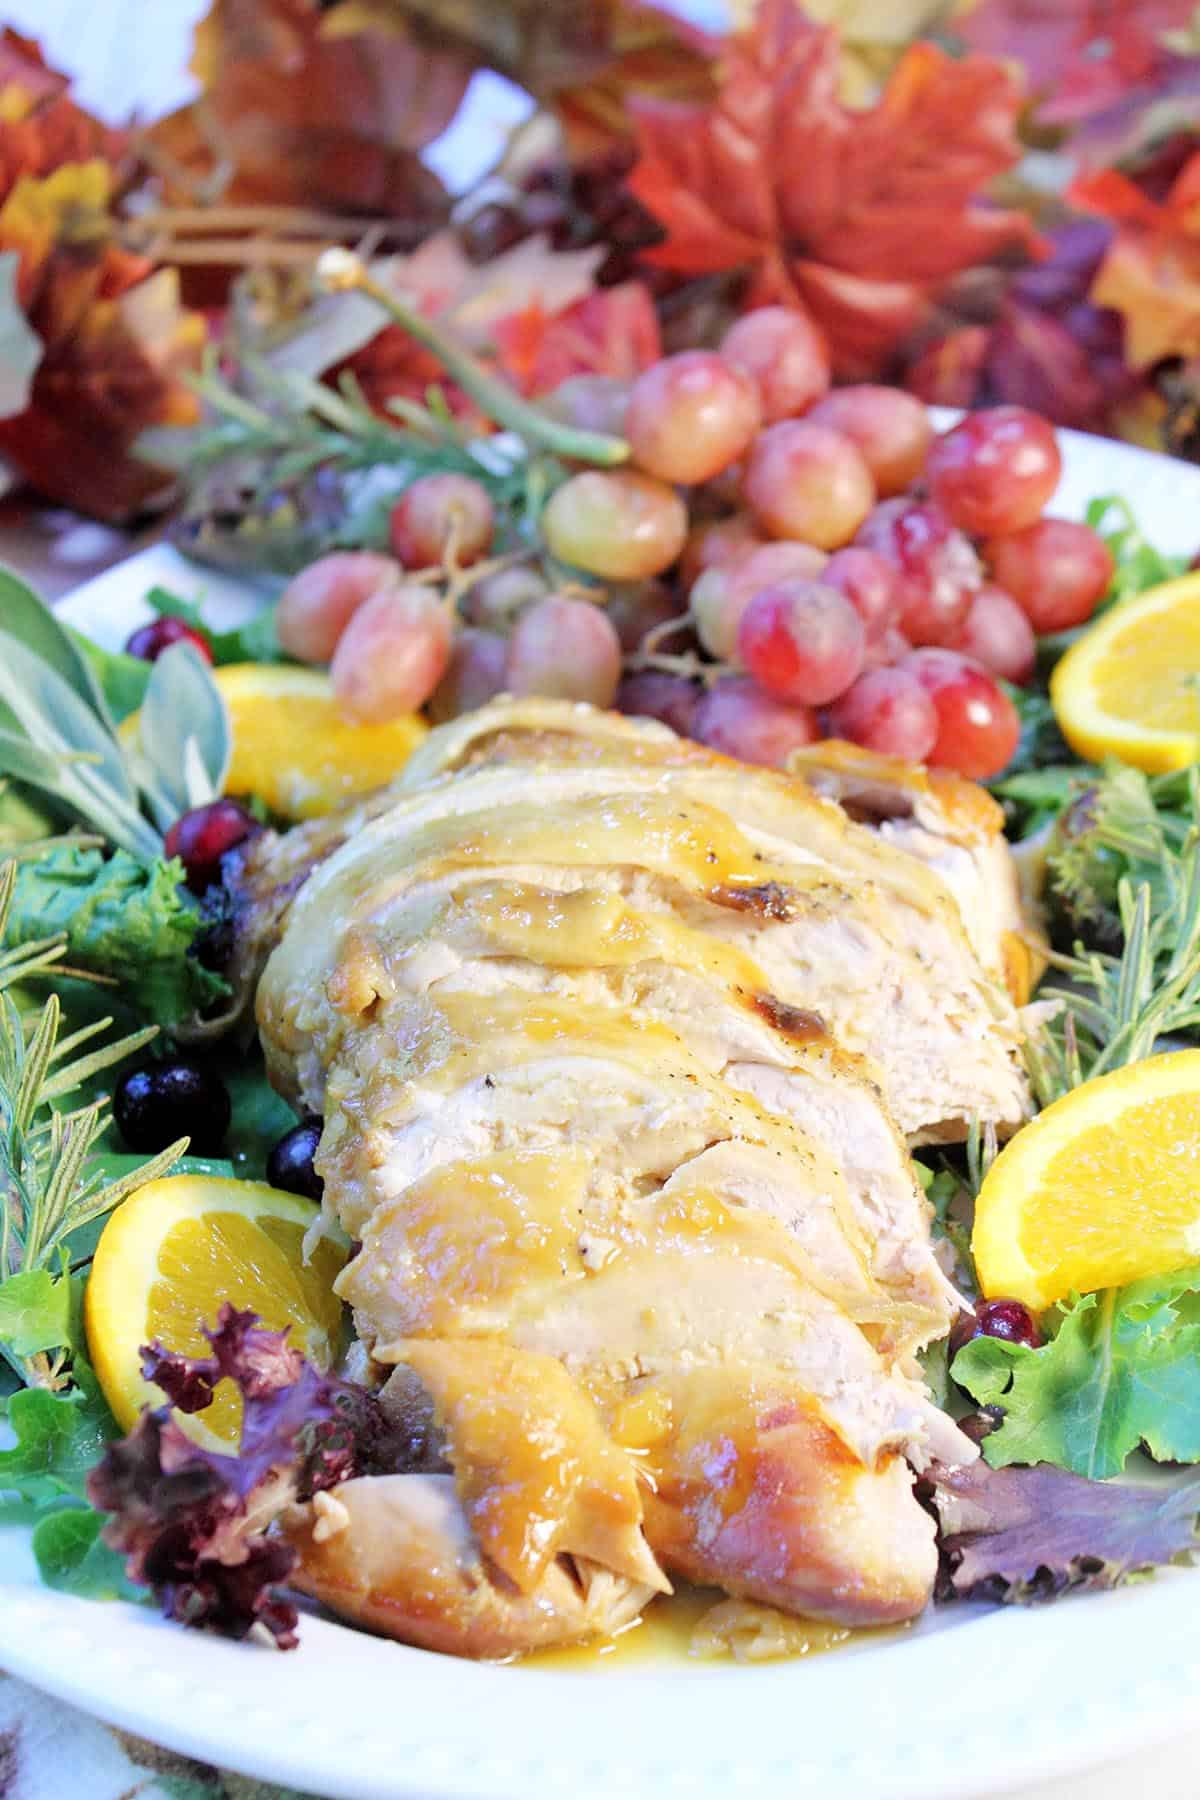 Sliced turkey on fruit decorated platter.